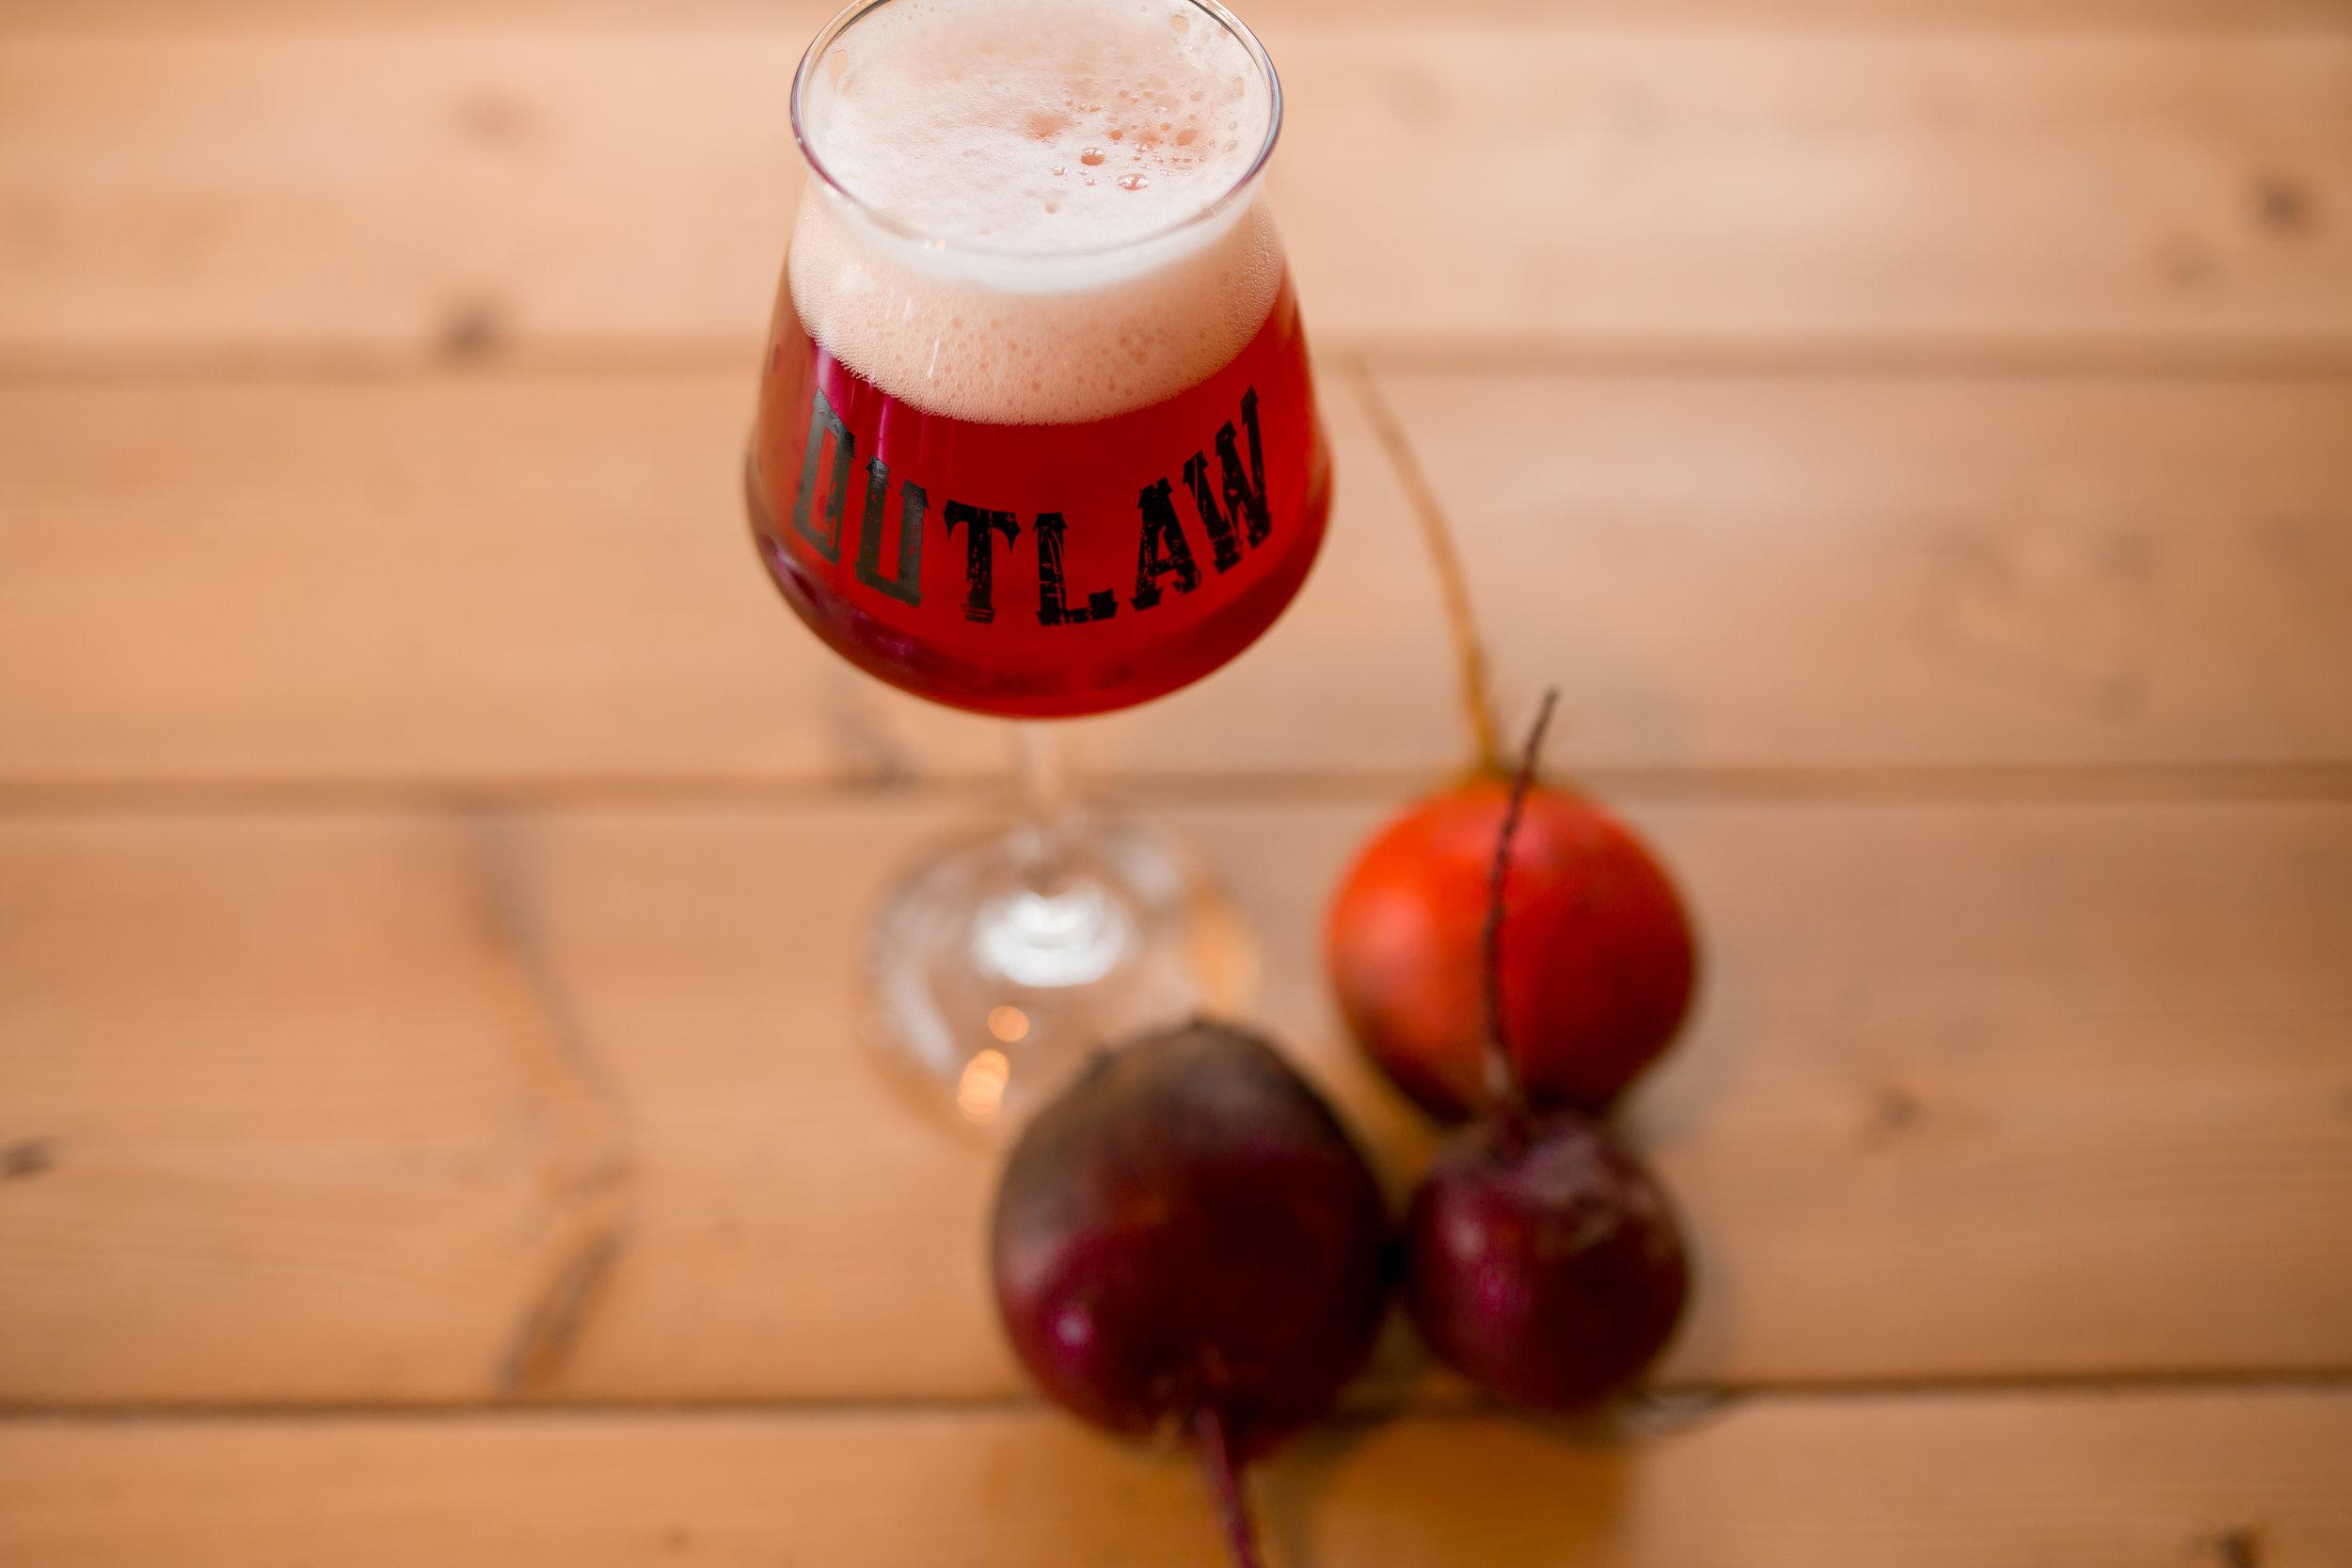 Outlaw's 'Hi-Berry Beet' Beer